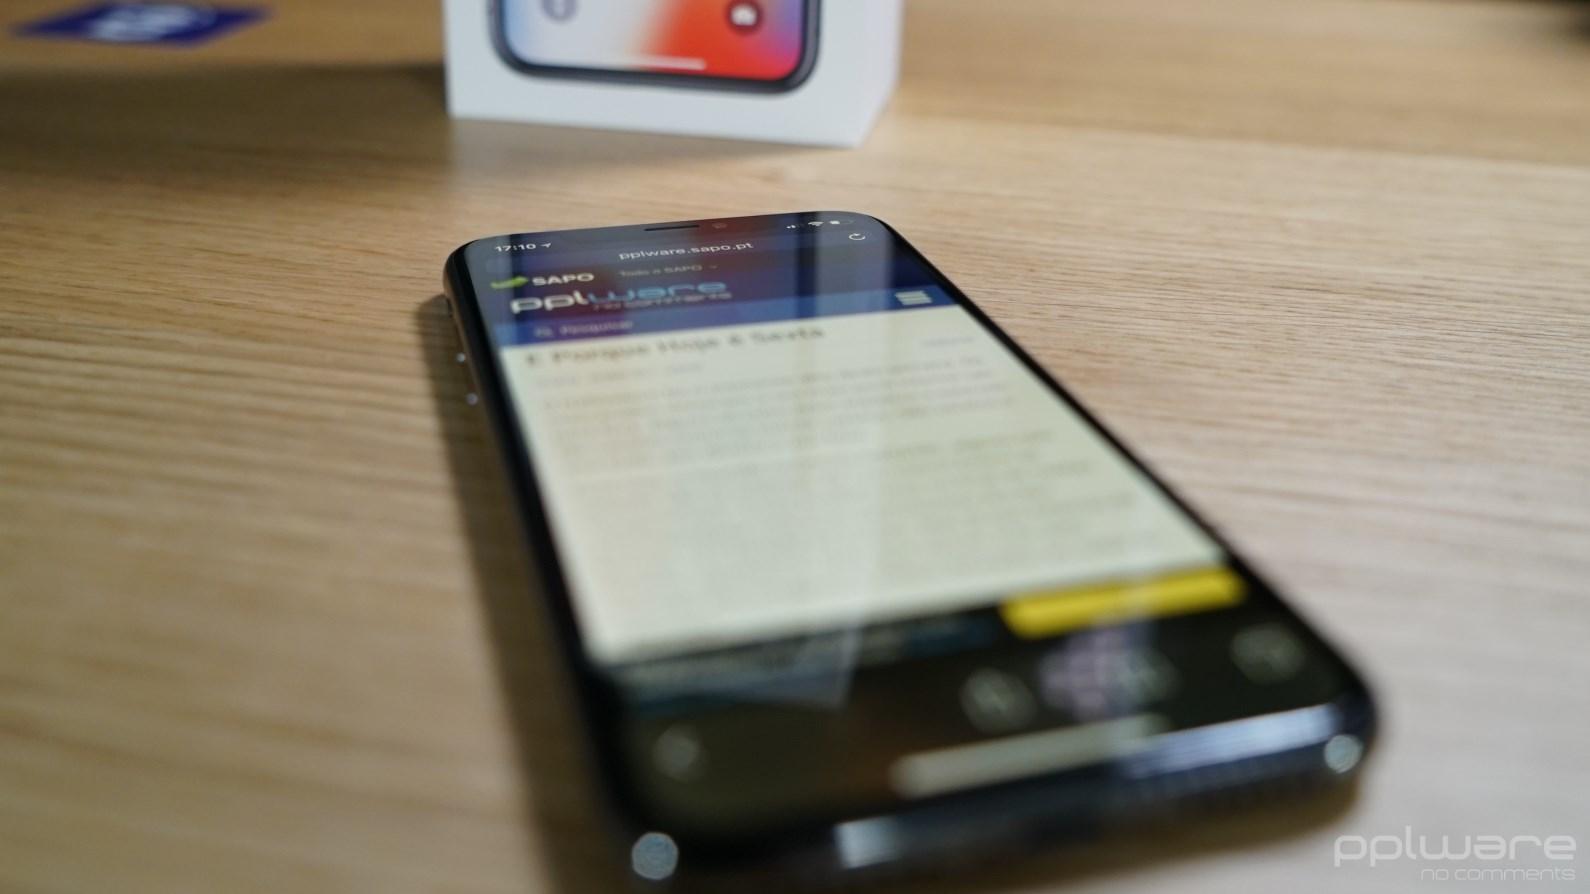 Apple justifica os problemas reportados no ecrã do iPhone X